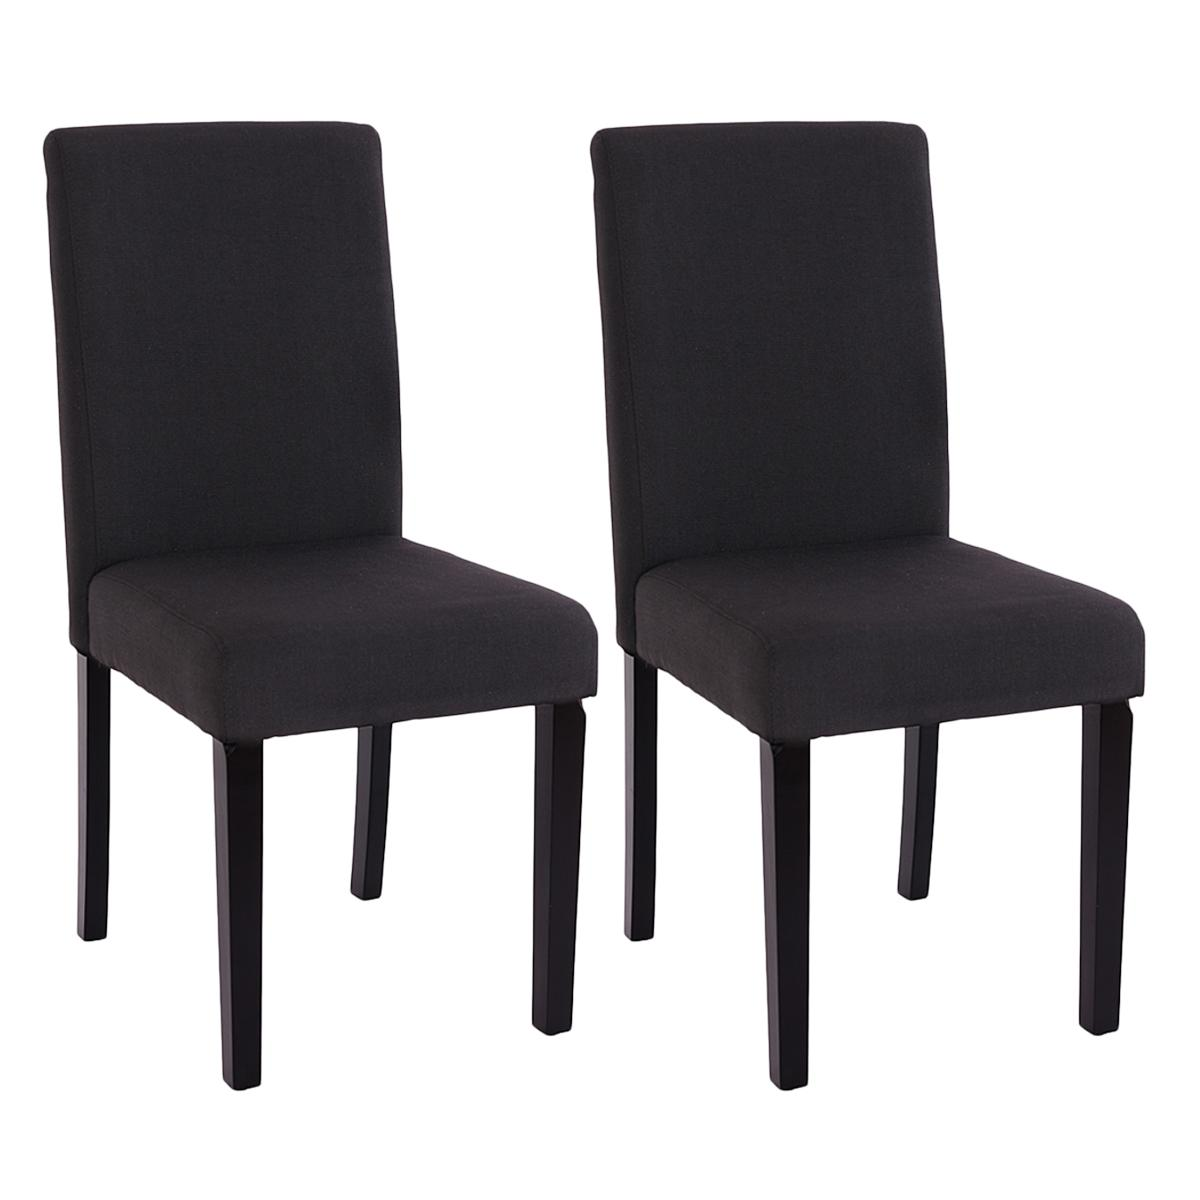 Lote 2 sillas de comedor litau tela precioso dise o en for Sillas de tela comedor